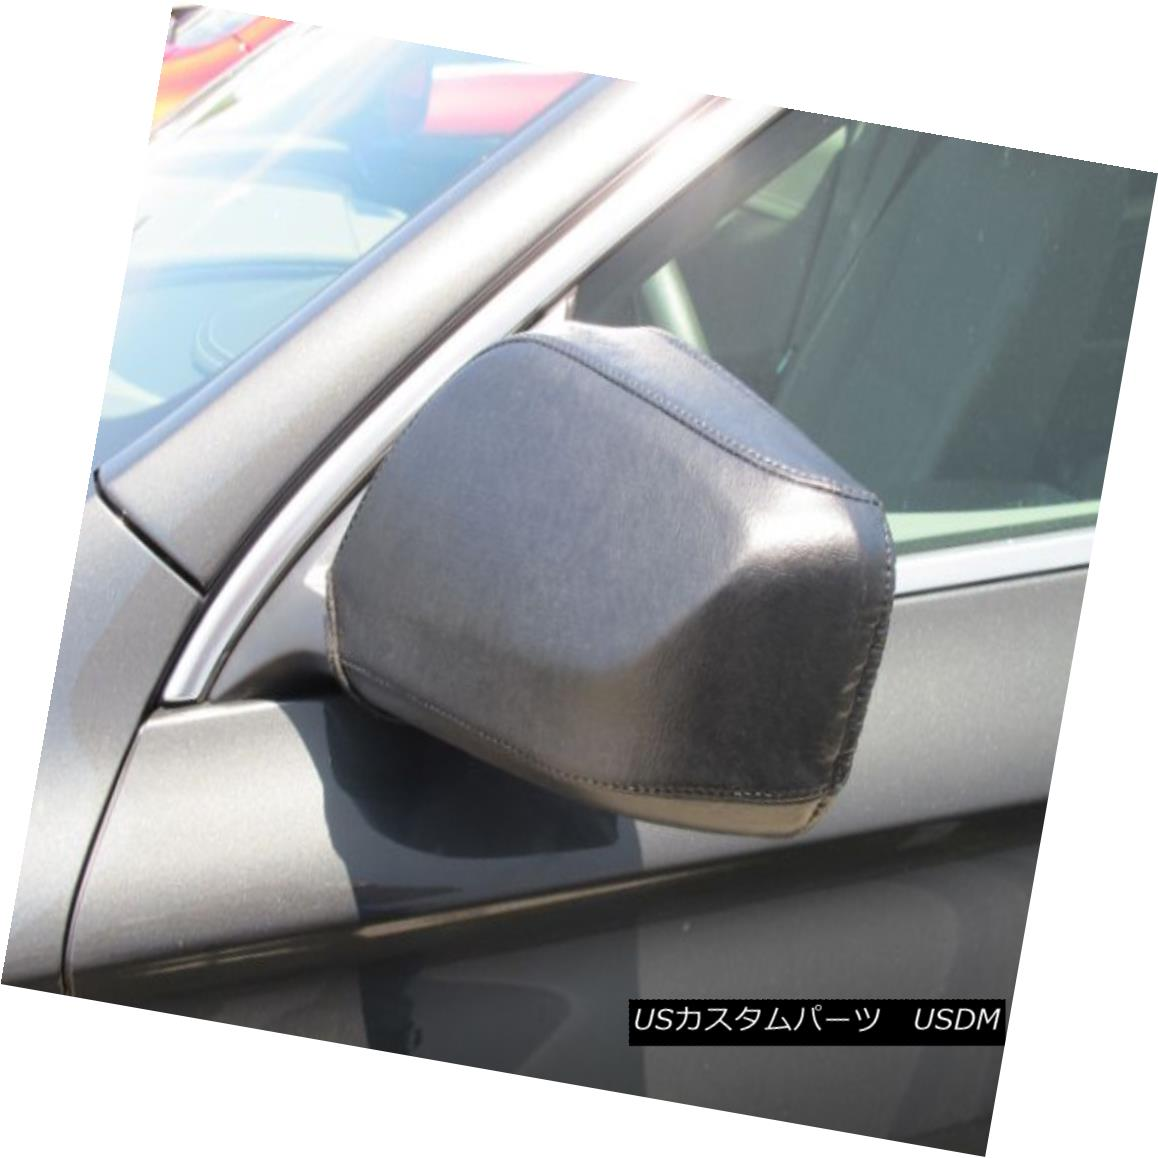 USフルブラ・USノーズブラ Colgan Car Mirror Covers Bra Protector Black Fits Chevy Impala LS, LT,& LTZ Sed. Colgan Car Mirror CoversブラジャープロテクターブラックはChevy Impala LS、LT、& amp; LTZ Sed。